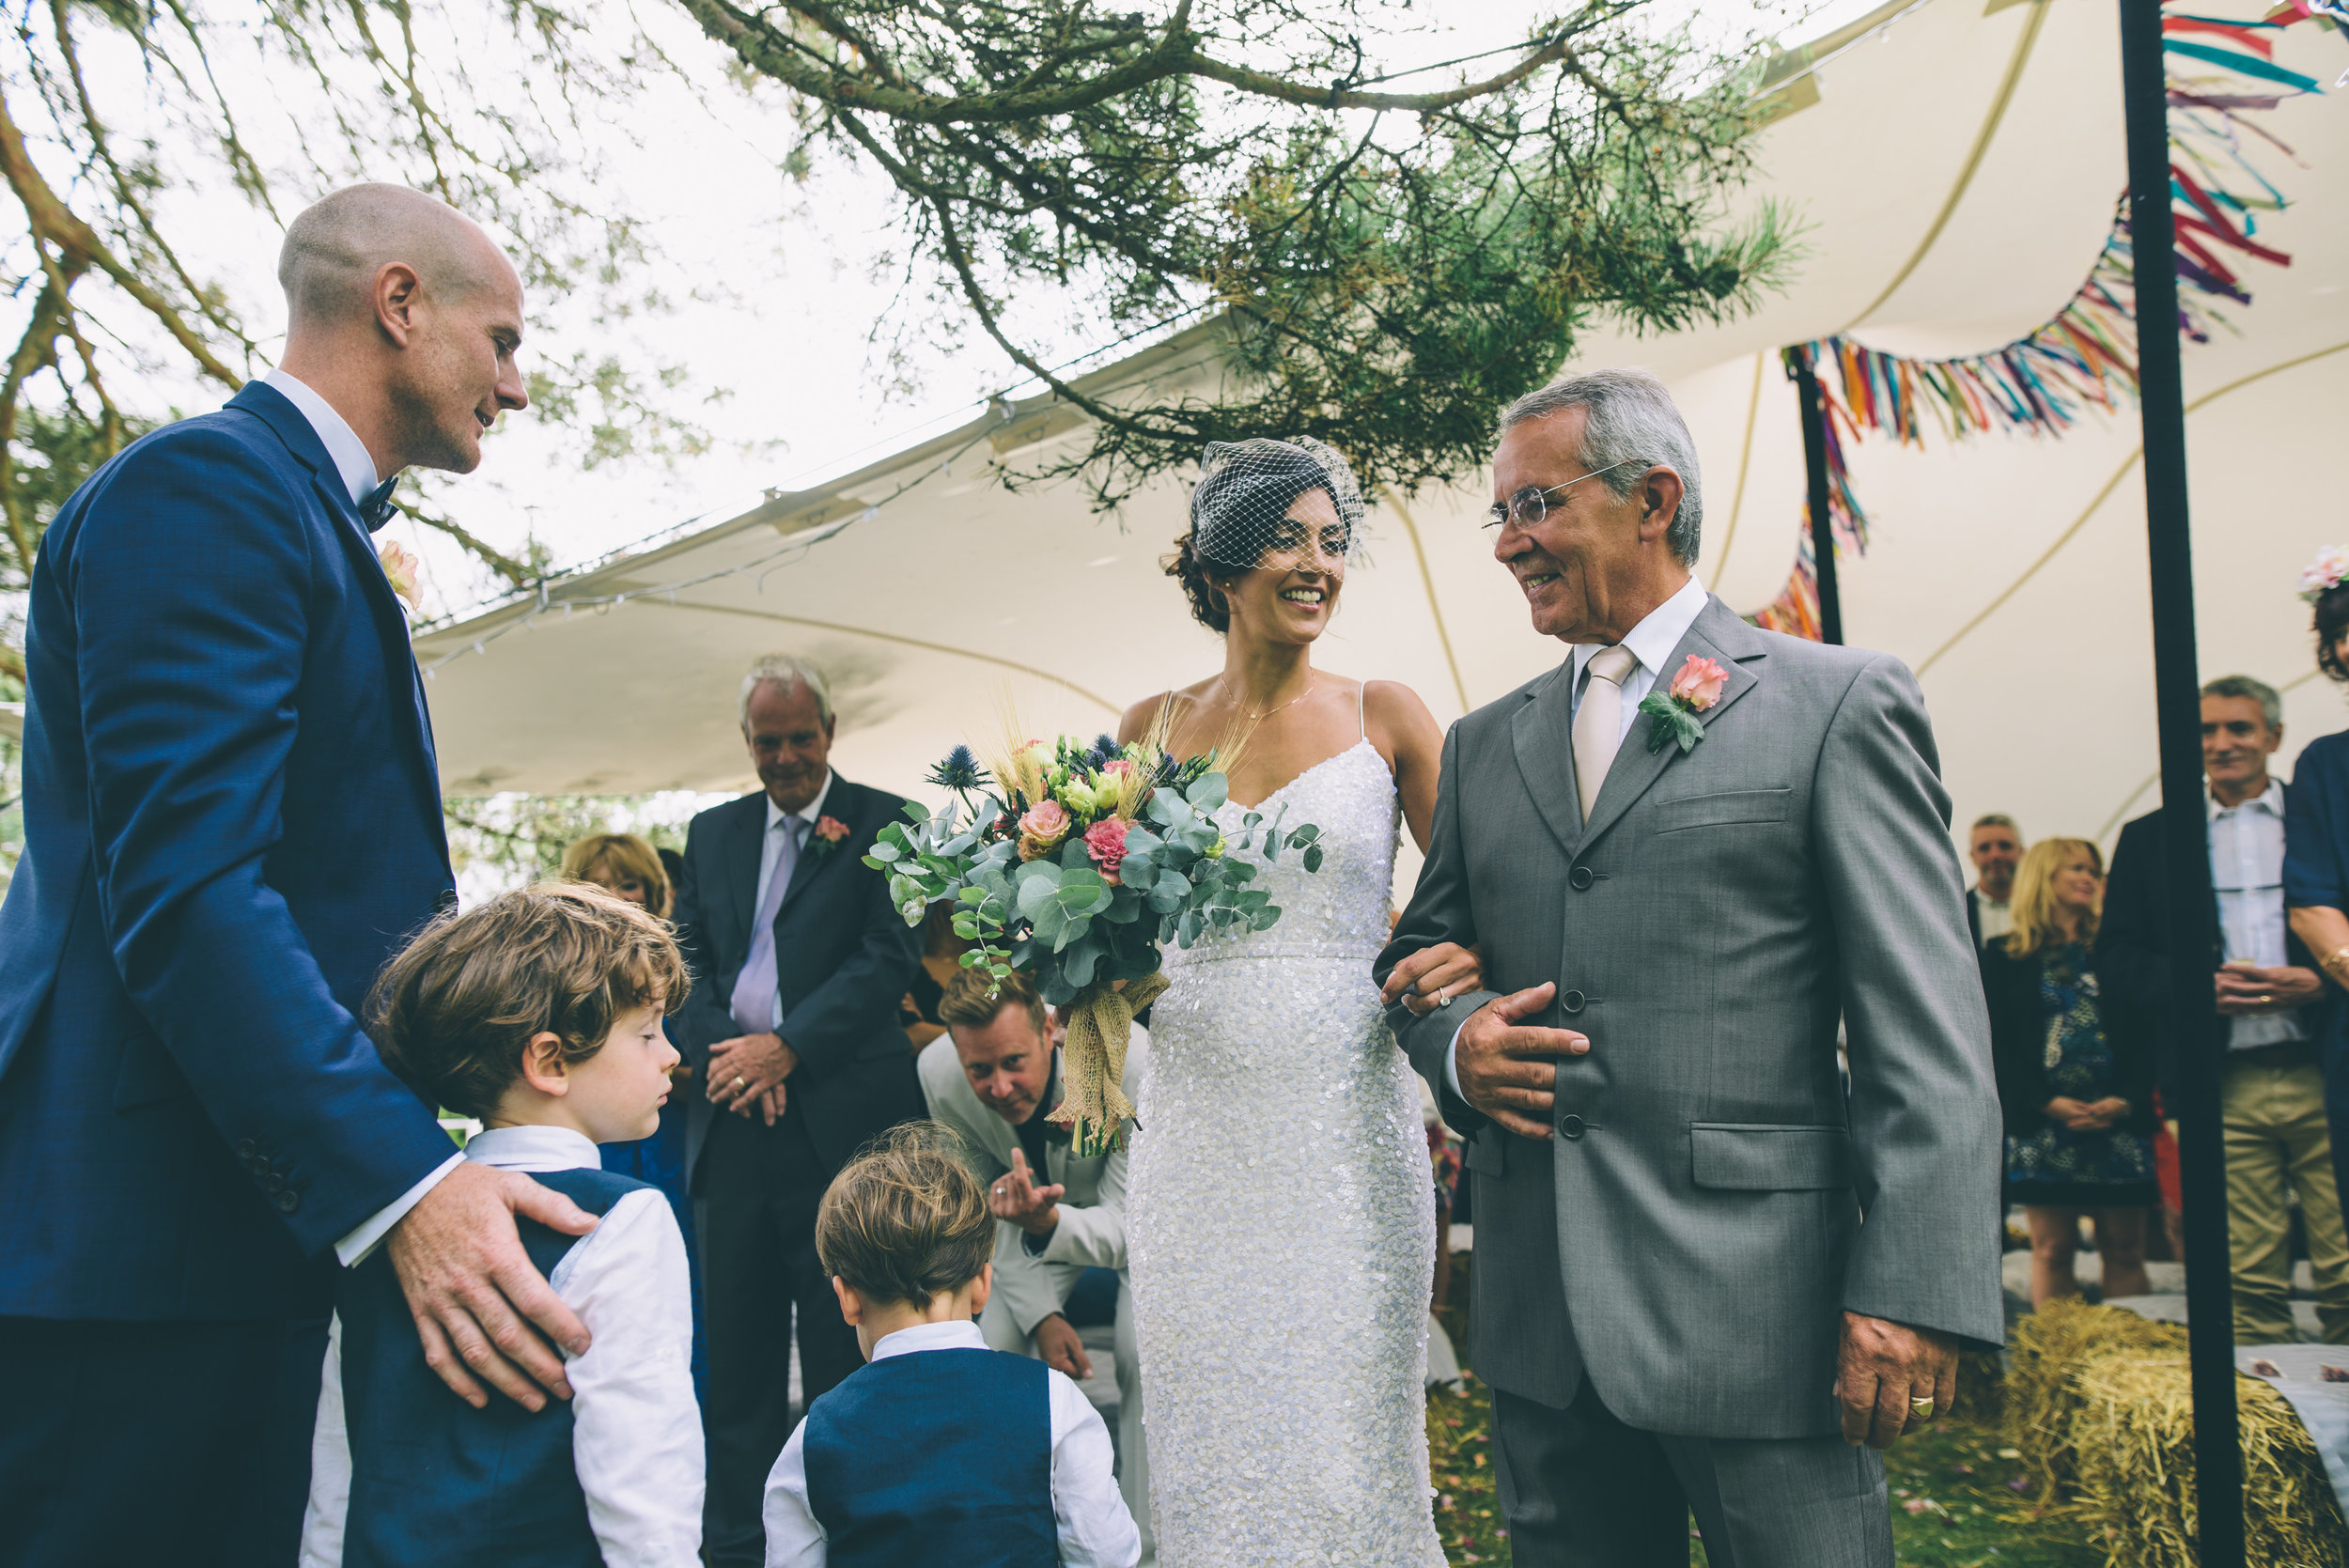 Garden Wedding photography Barley Herefordshire - Tracy + Matt -150.jpg